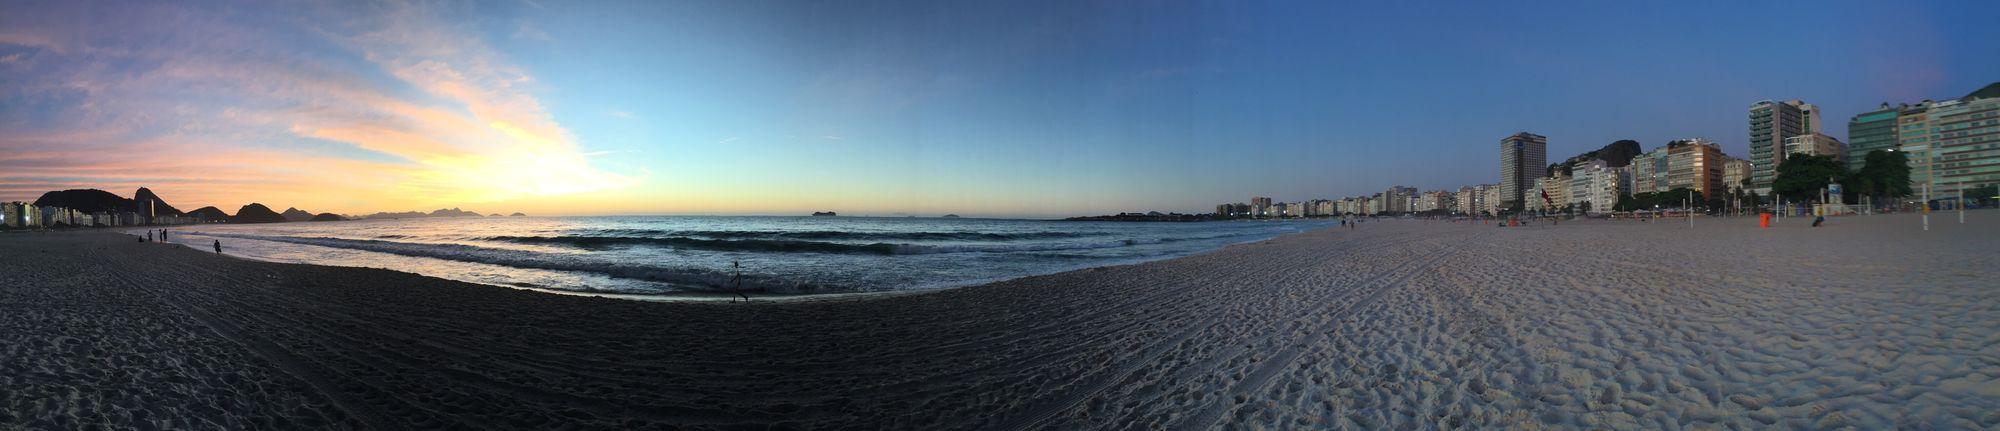 Manhã em Copacabana Beach Beauty In Nature